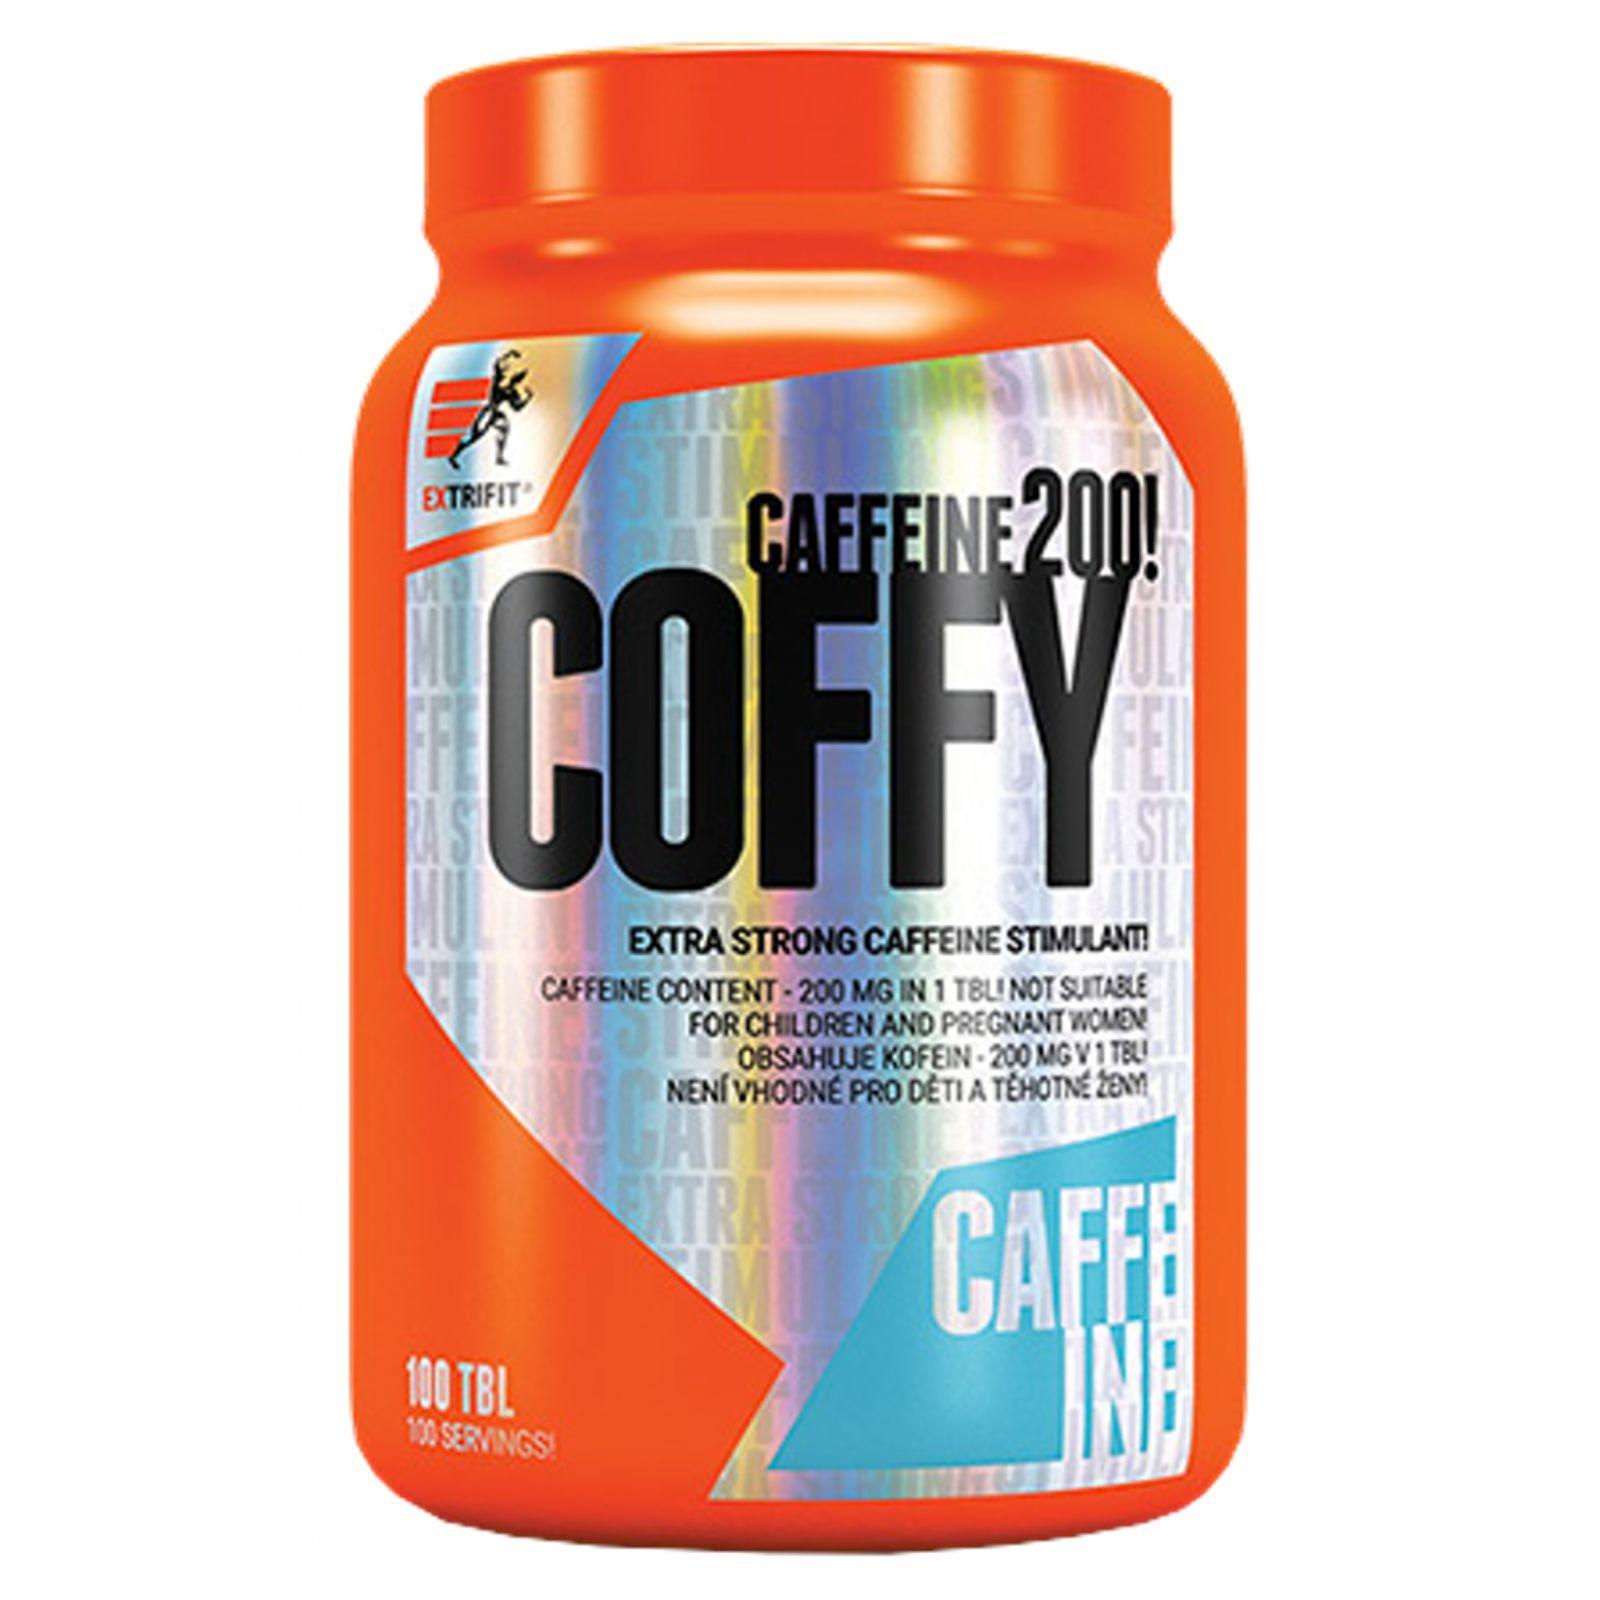 Extrifit Coffy Stimulant 200 mg - 100 tablet